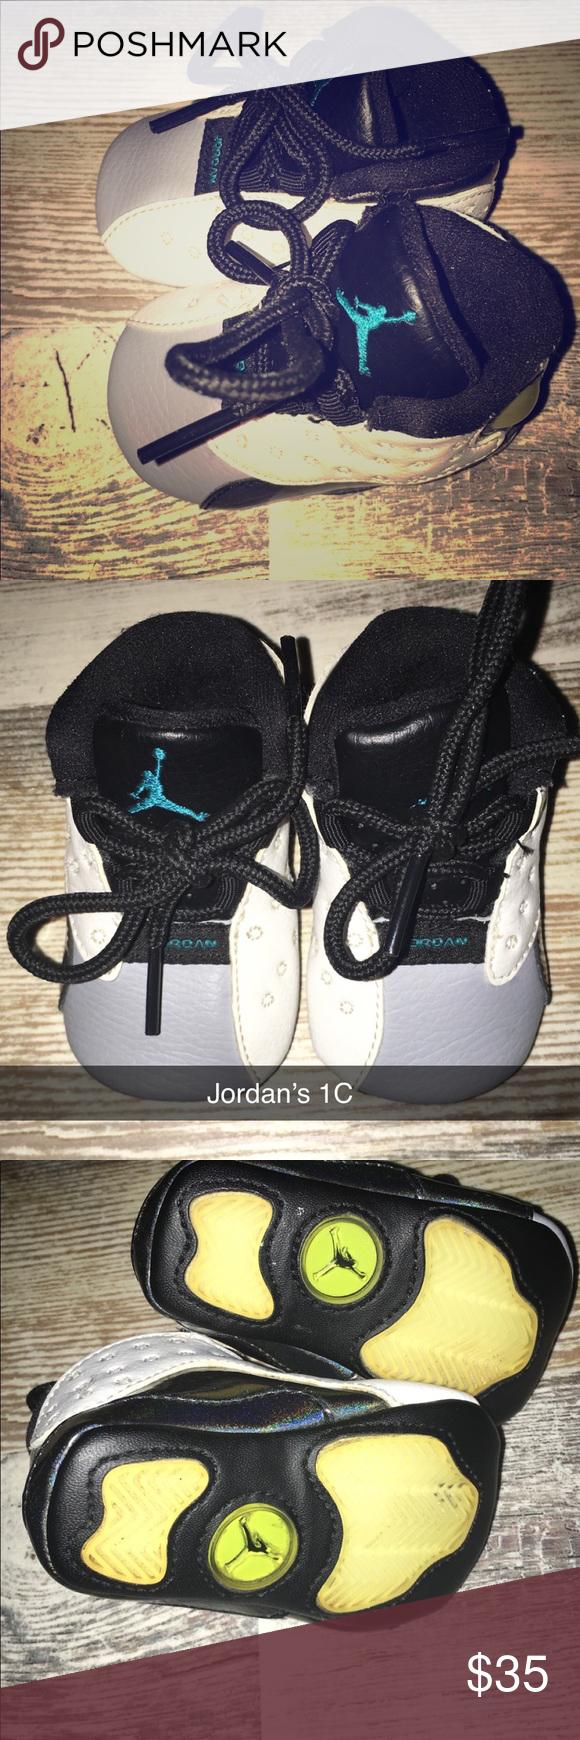 Jordan's 1C baby   Baby walker, Baby jordans, Jordan shoes